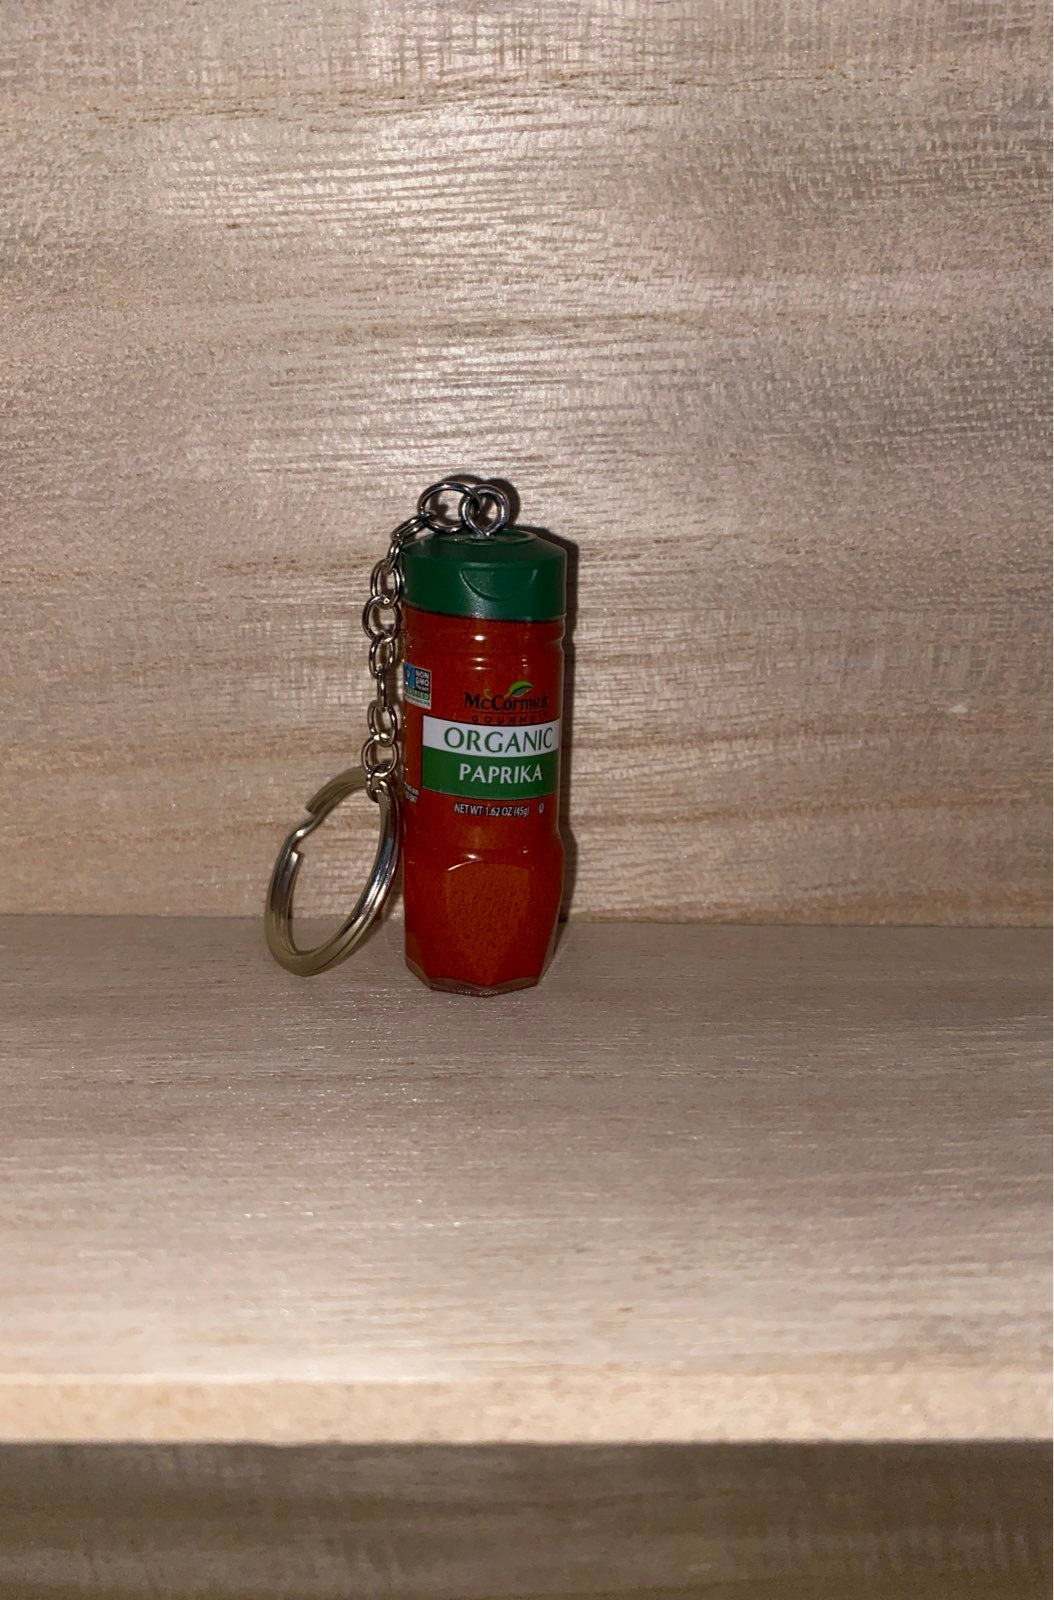 mini brands series 2 keychain